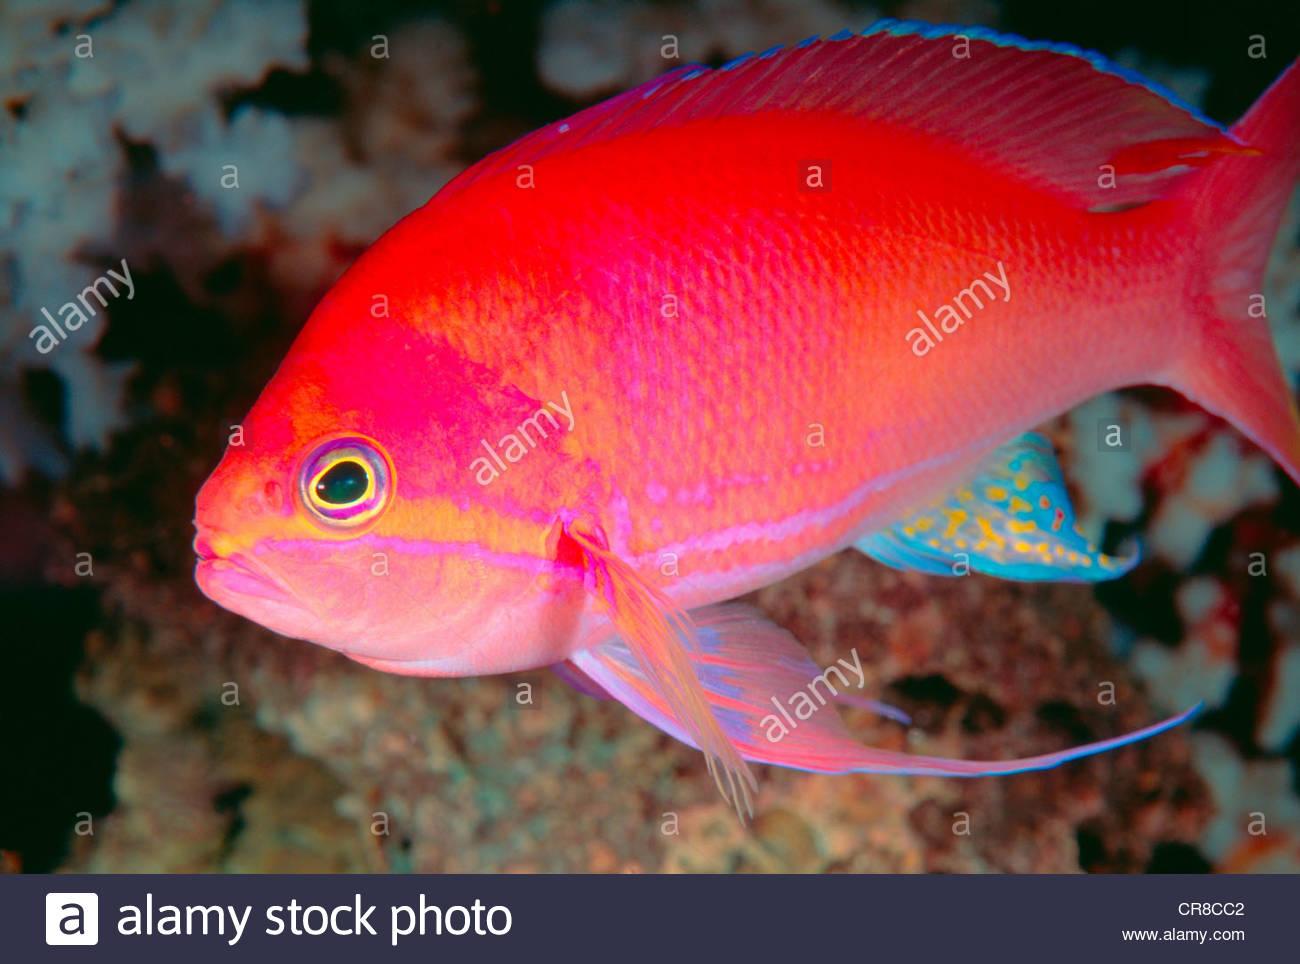 Close Up Of A Bright Tropical Fish Stock Photo Royalty